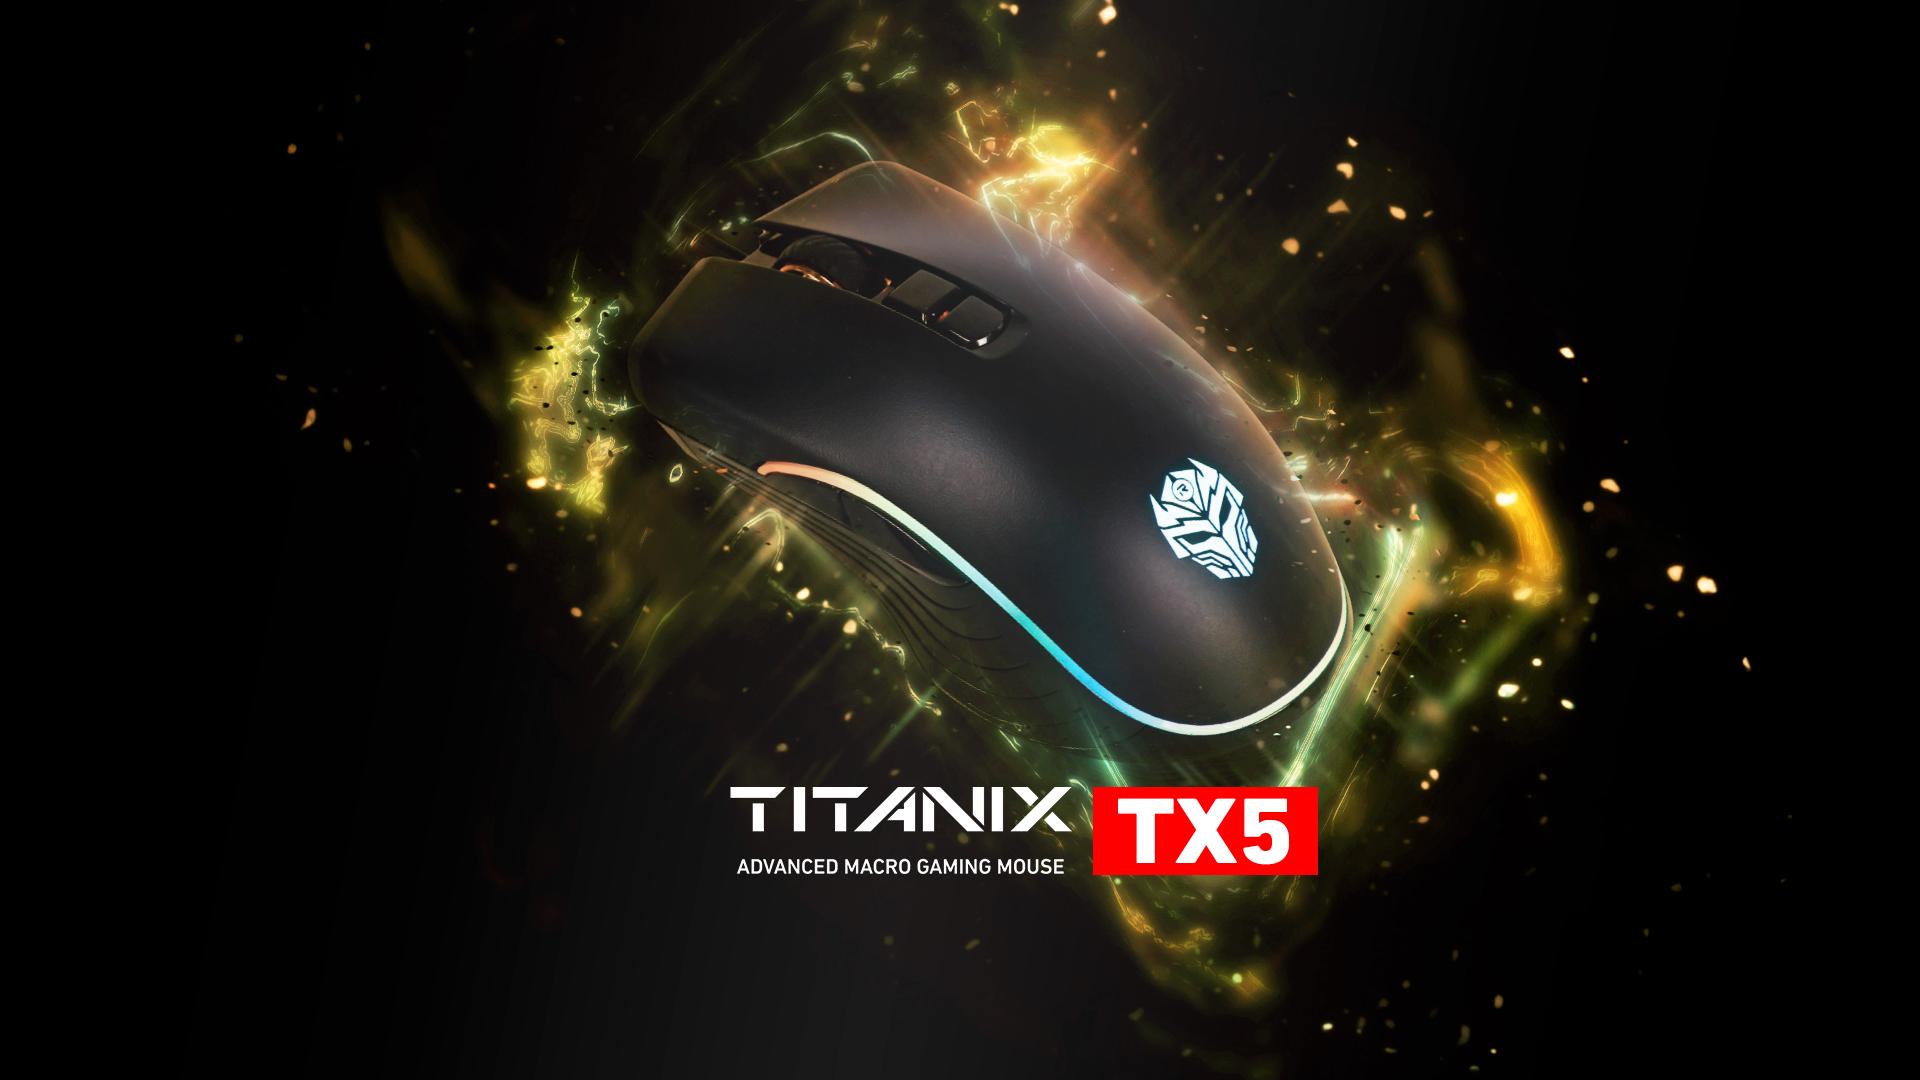 gaming mouse Dual Layer PCB, Teknologi yang Bikin Gaming Mouse Makin Awet tx5 thumbnail